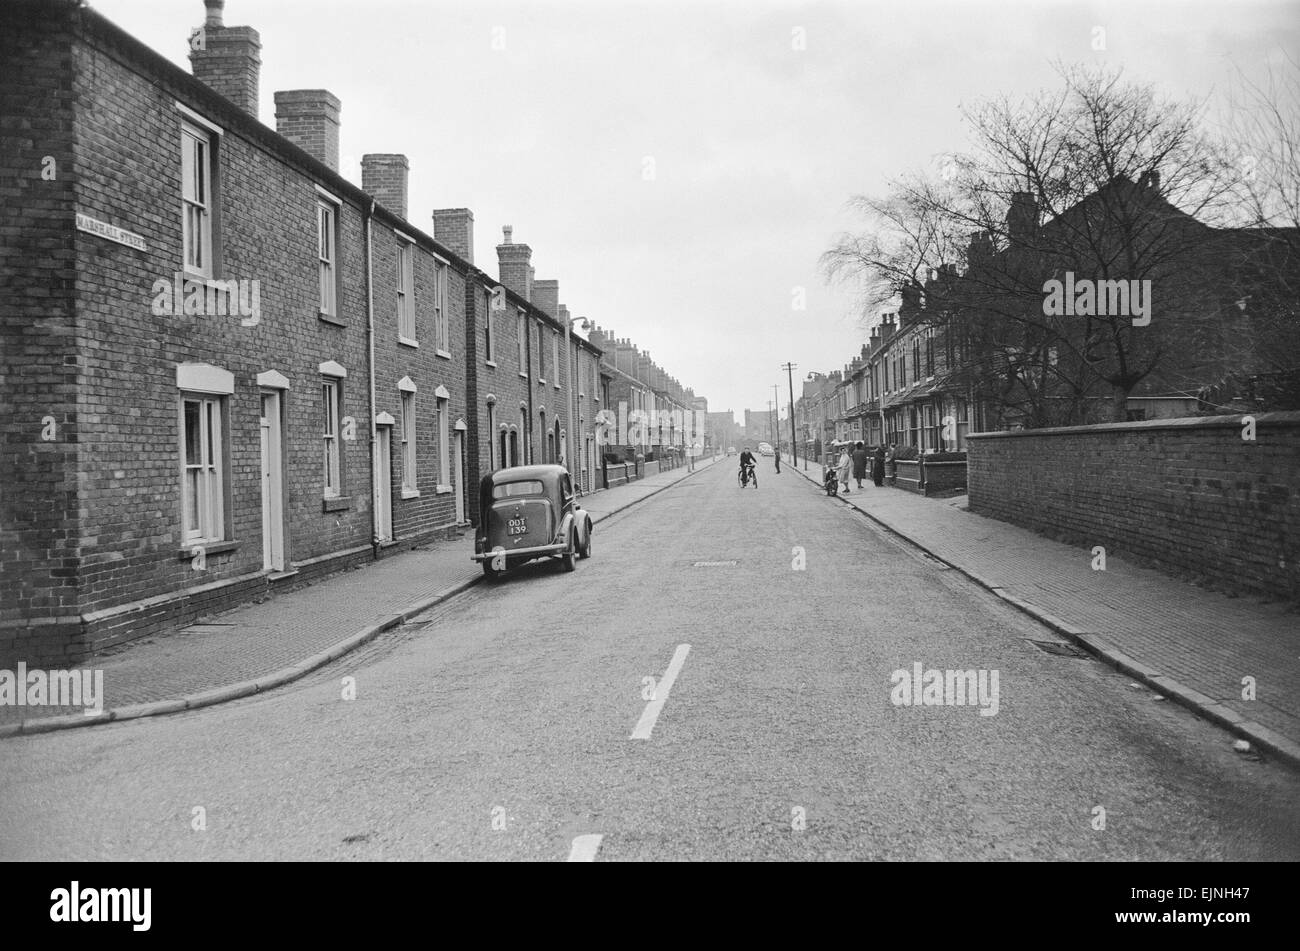 Marshall Street Smethwick 1st December 1964 *** Local Caption *** Watscan - - 23/04/2010 - Stock Image